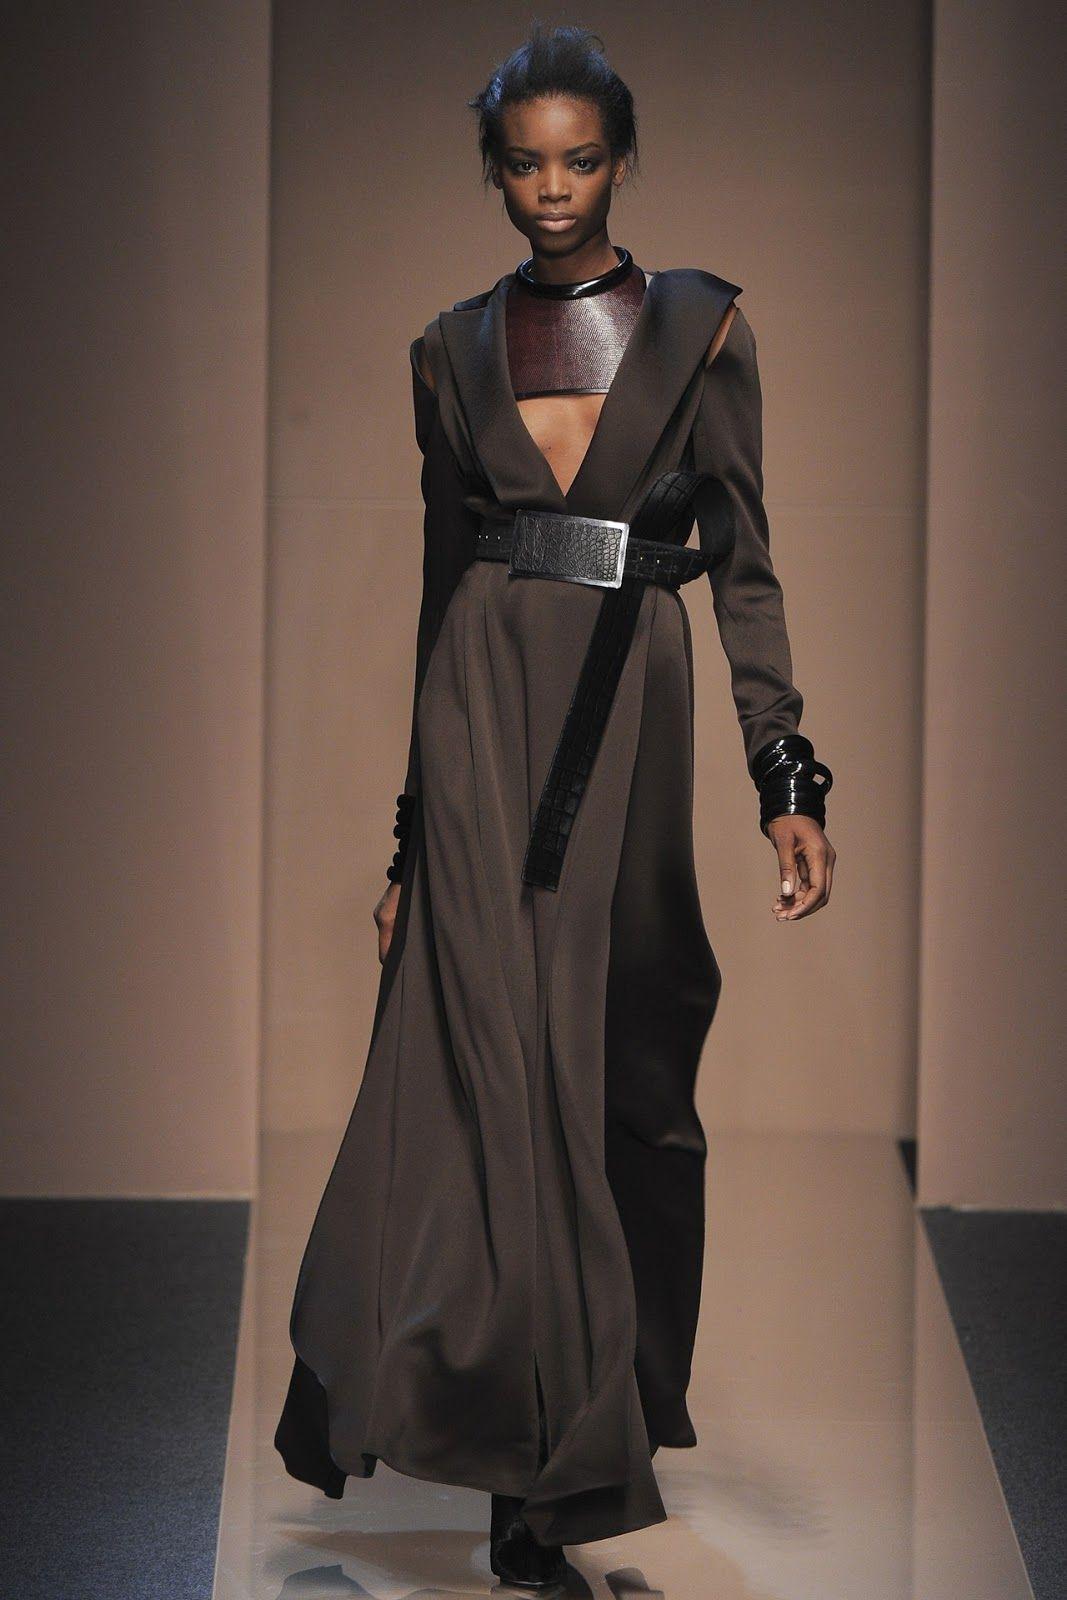 Te Dore F W 2013 2014 Gianfranco Ferre Milan Fashion Week Fashion Futuristic Fashion Fashion Week